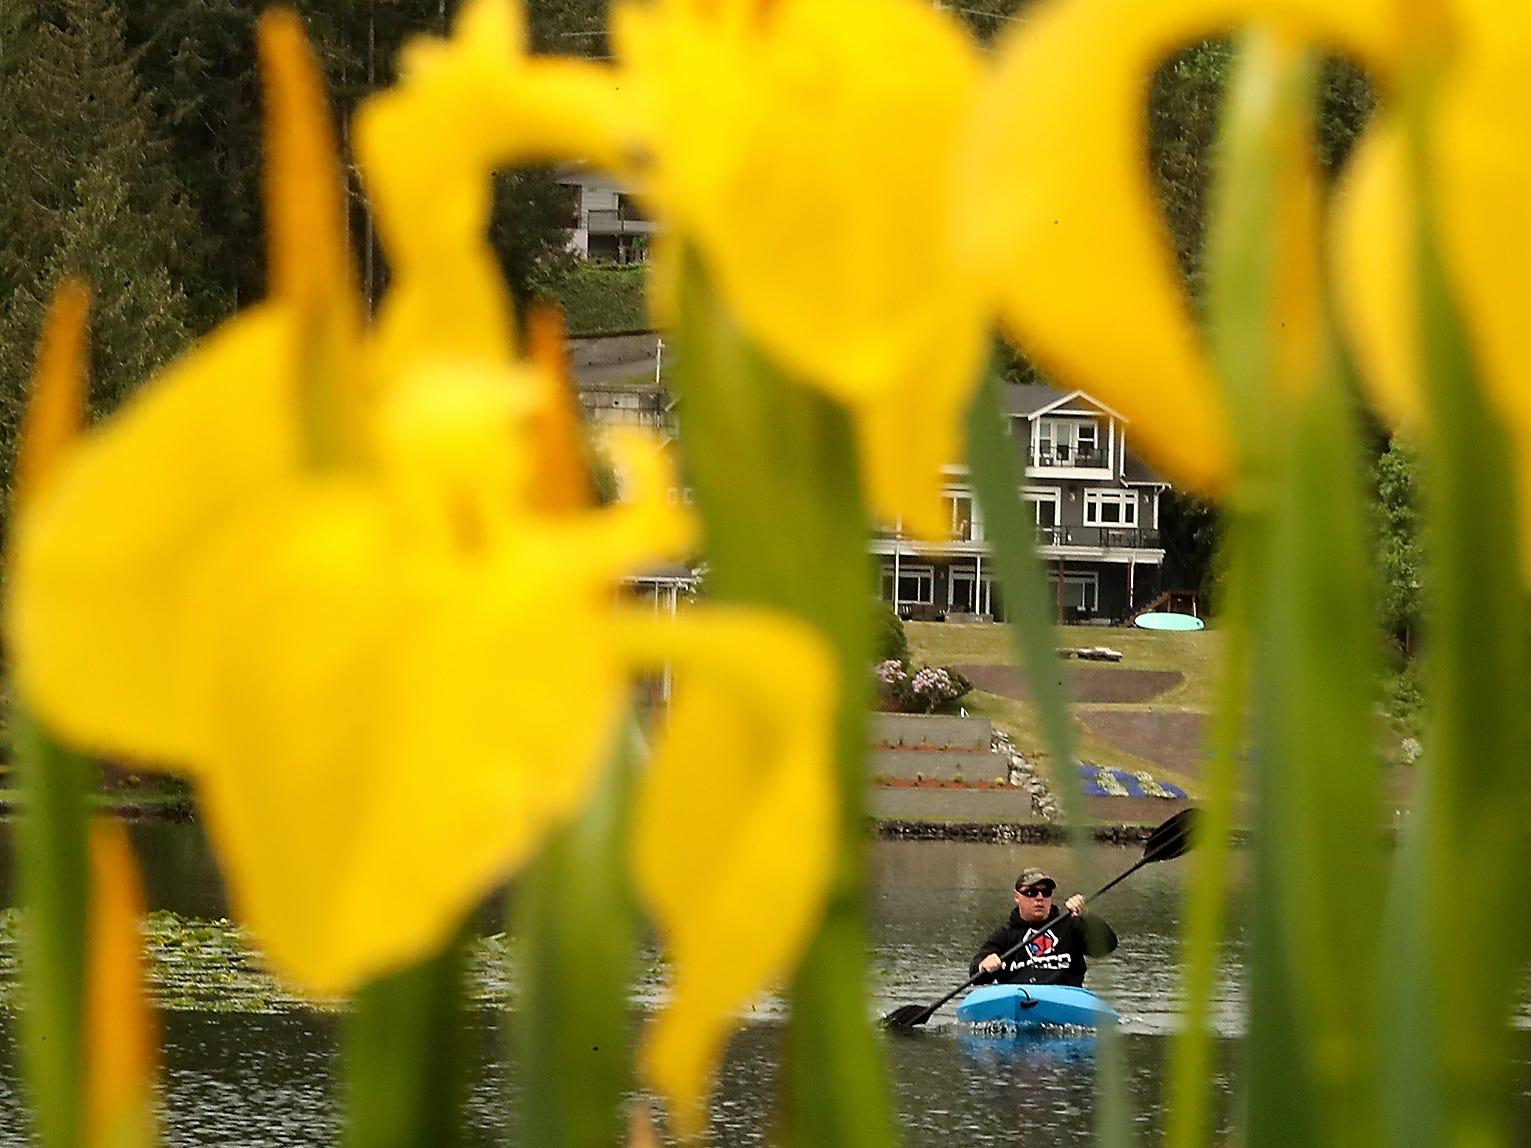 Framed by blooming cattails, Brandon Hampton, of Port Orchard, paddles his kayak toward the shore while fishing at Kitsap Lake on Monday, May 33, 2019.